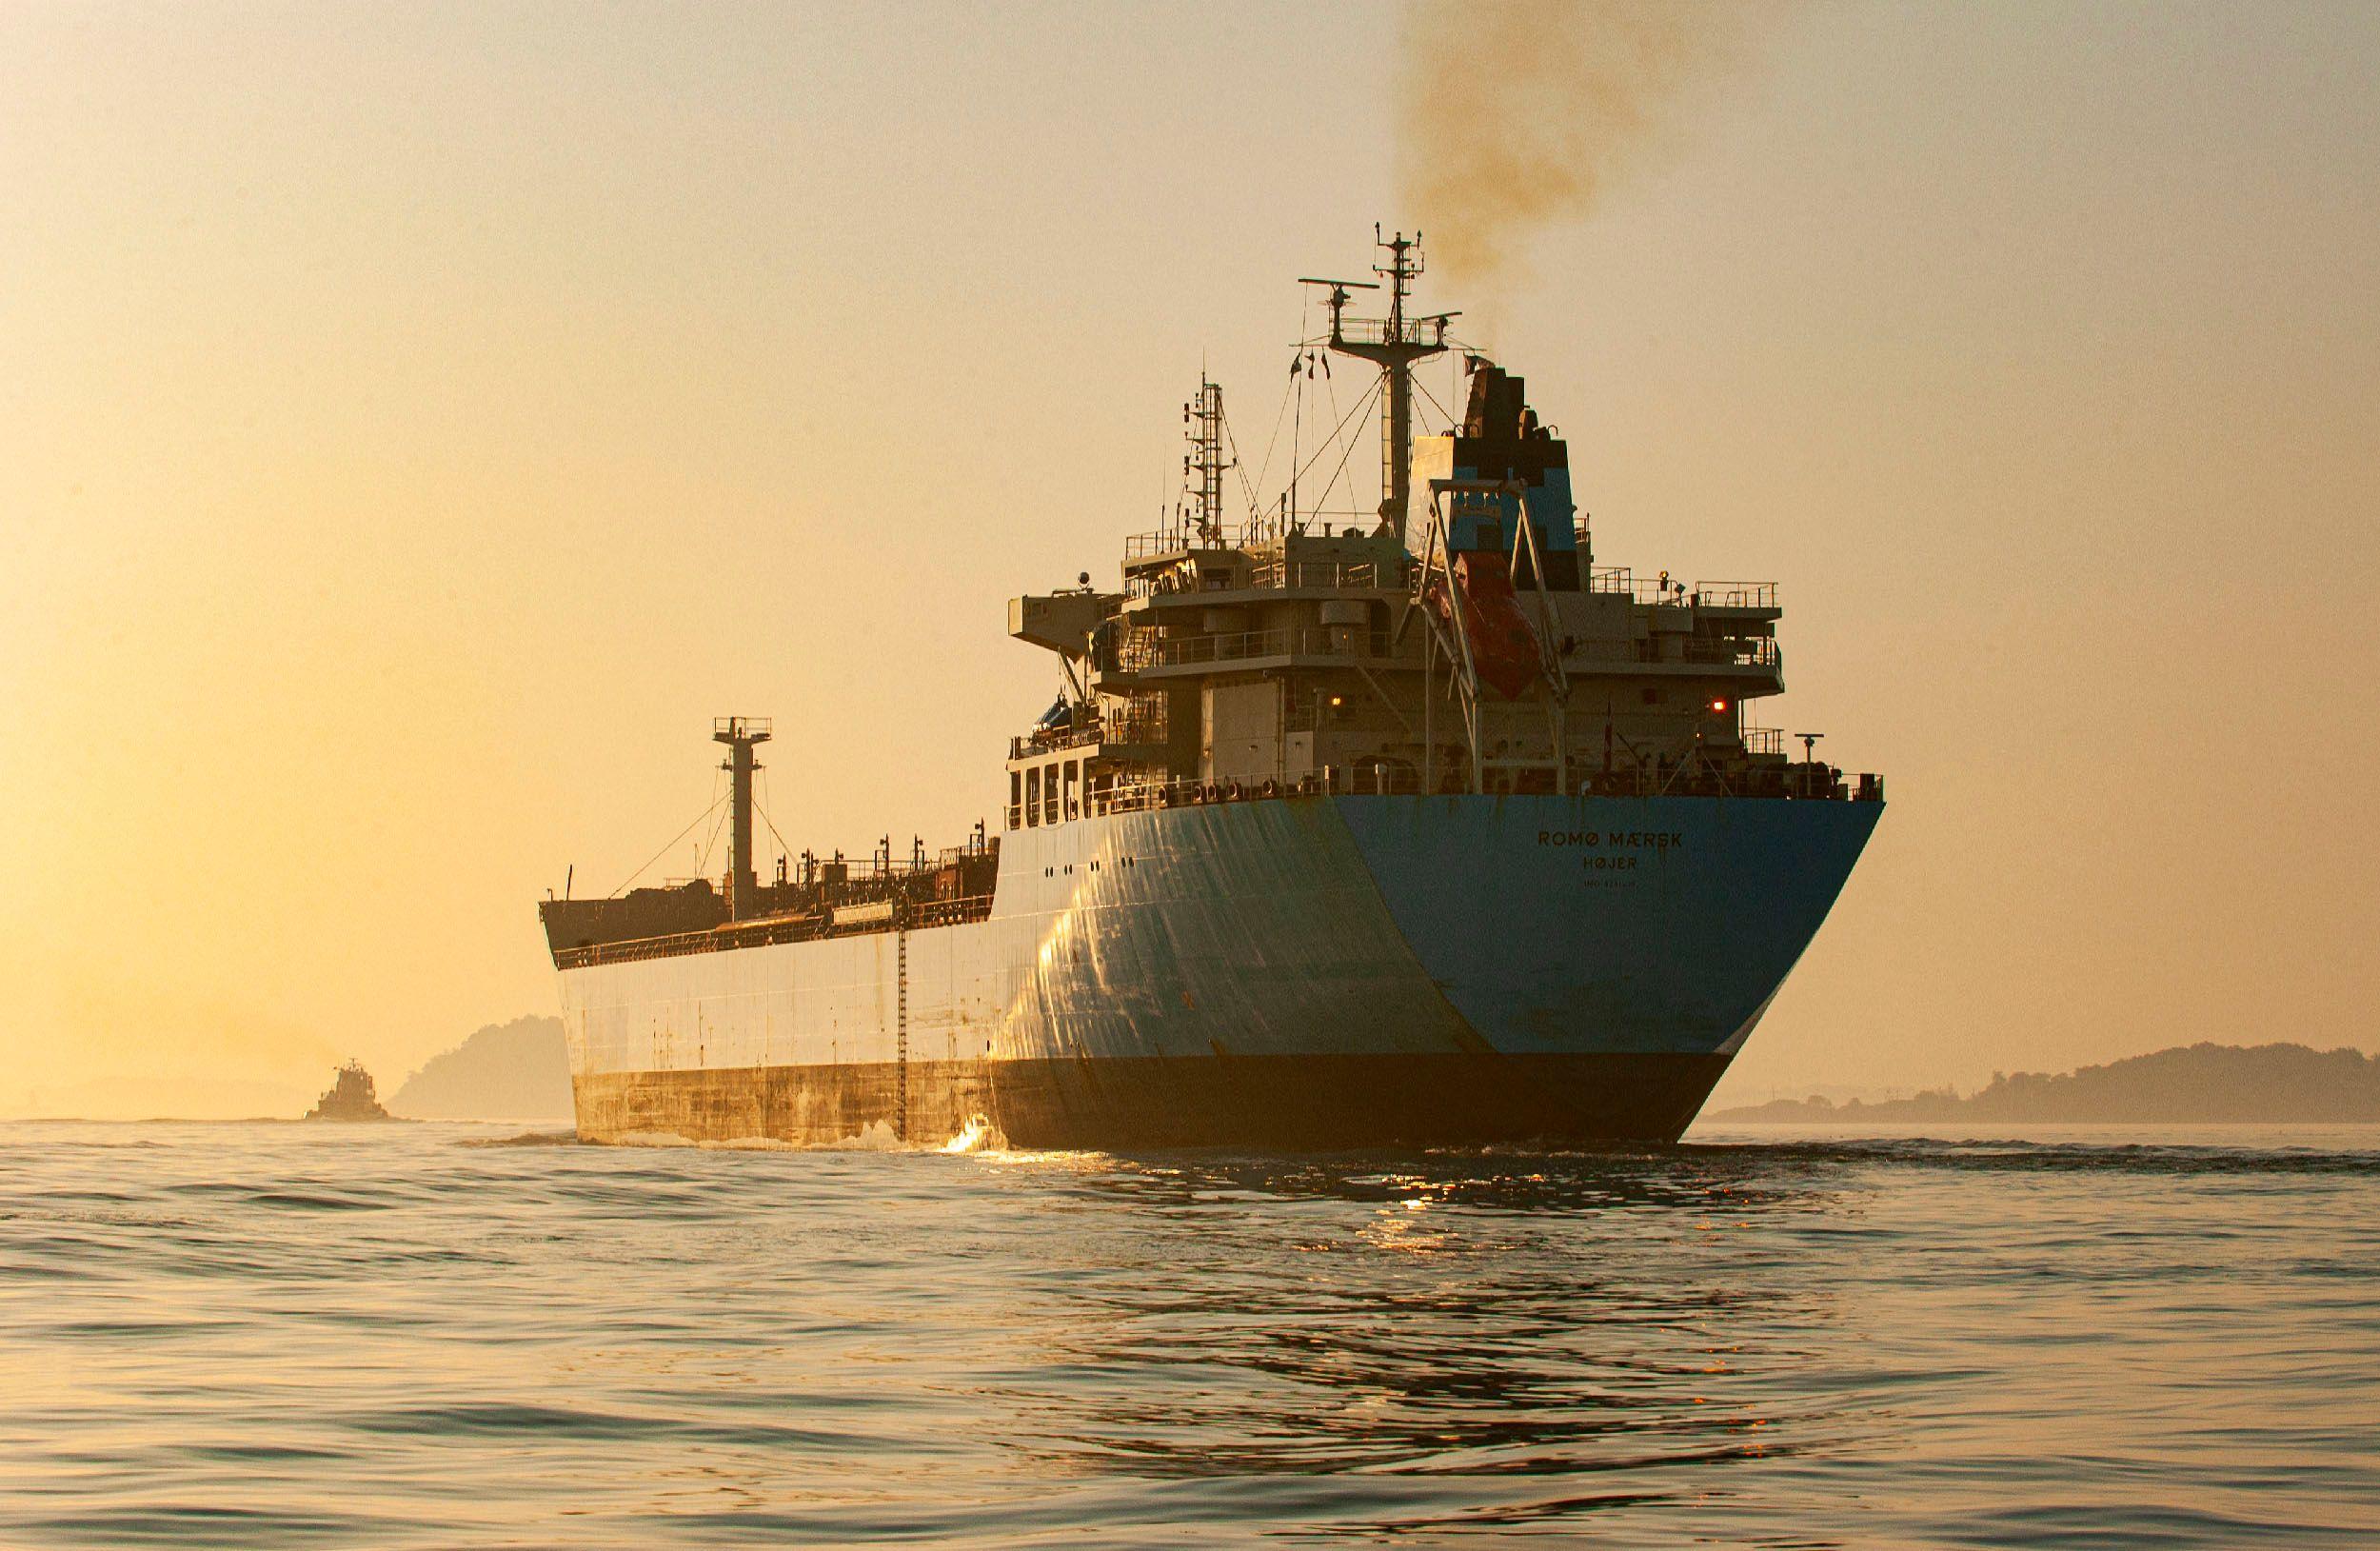 Crude oil tanker ship